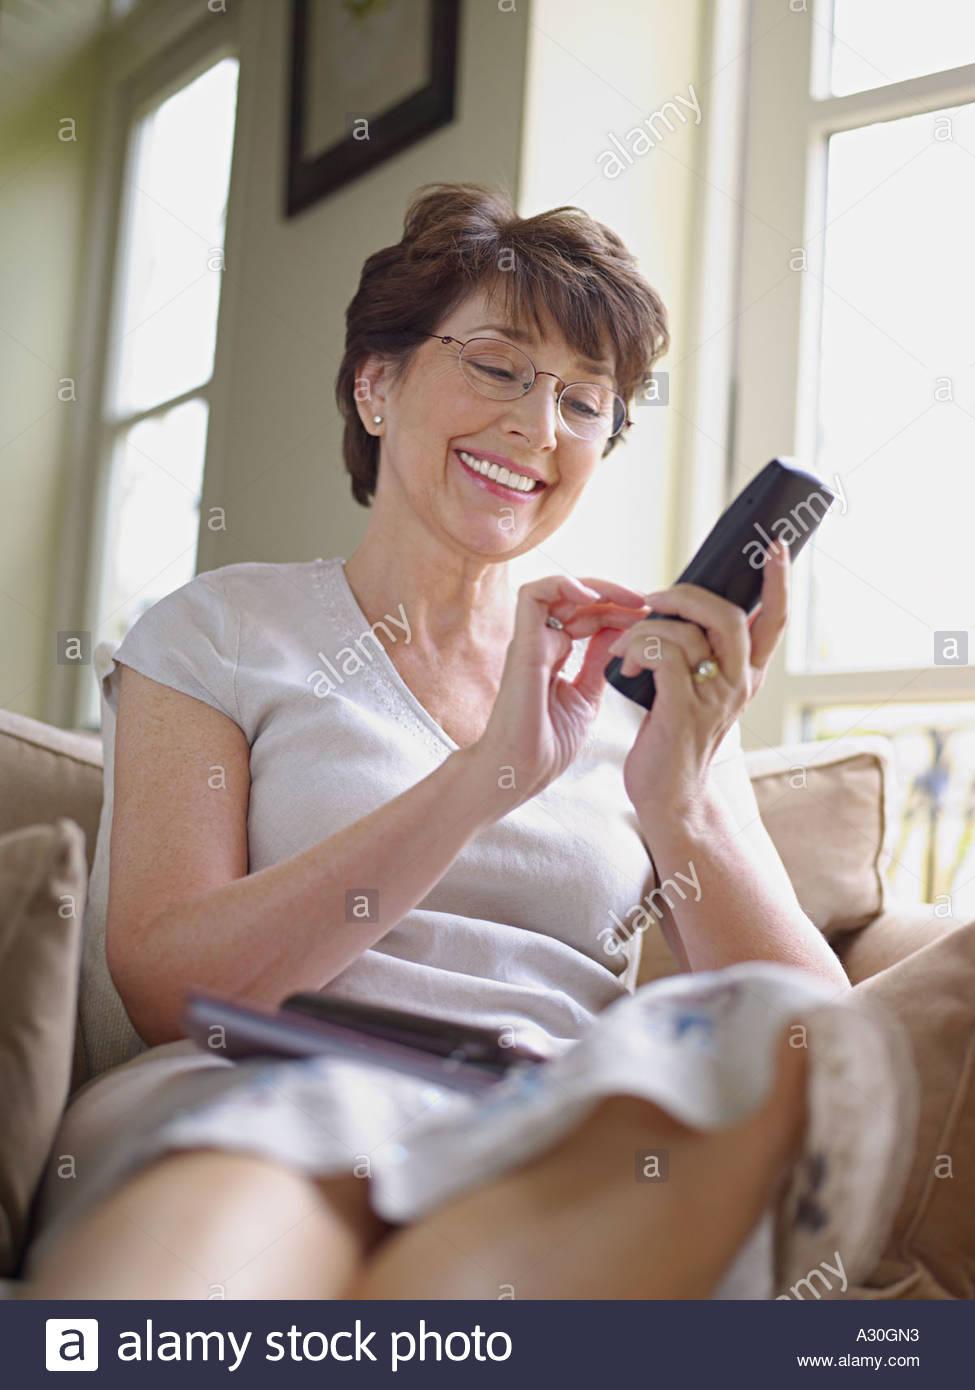 Woman making telephone call - Stock Image